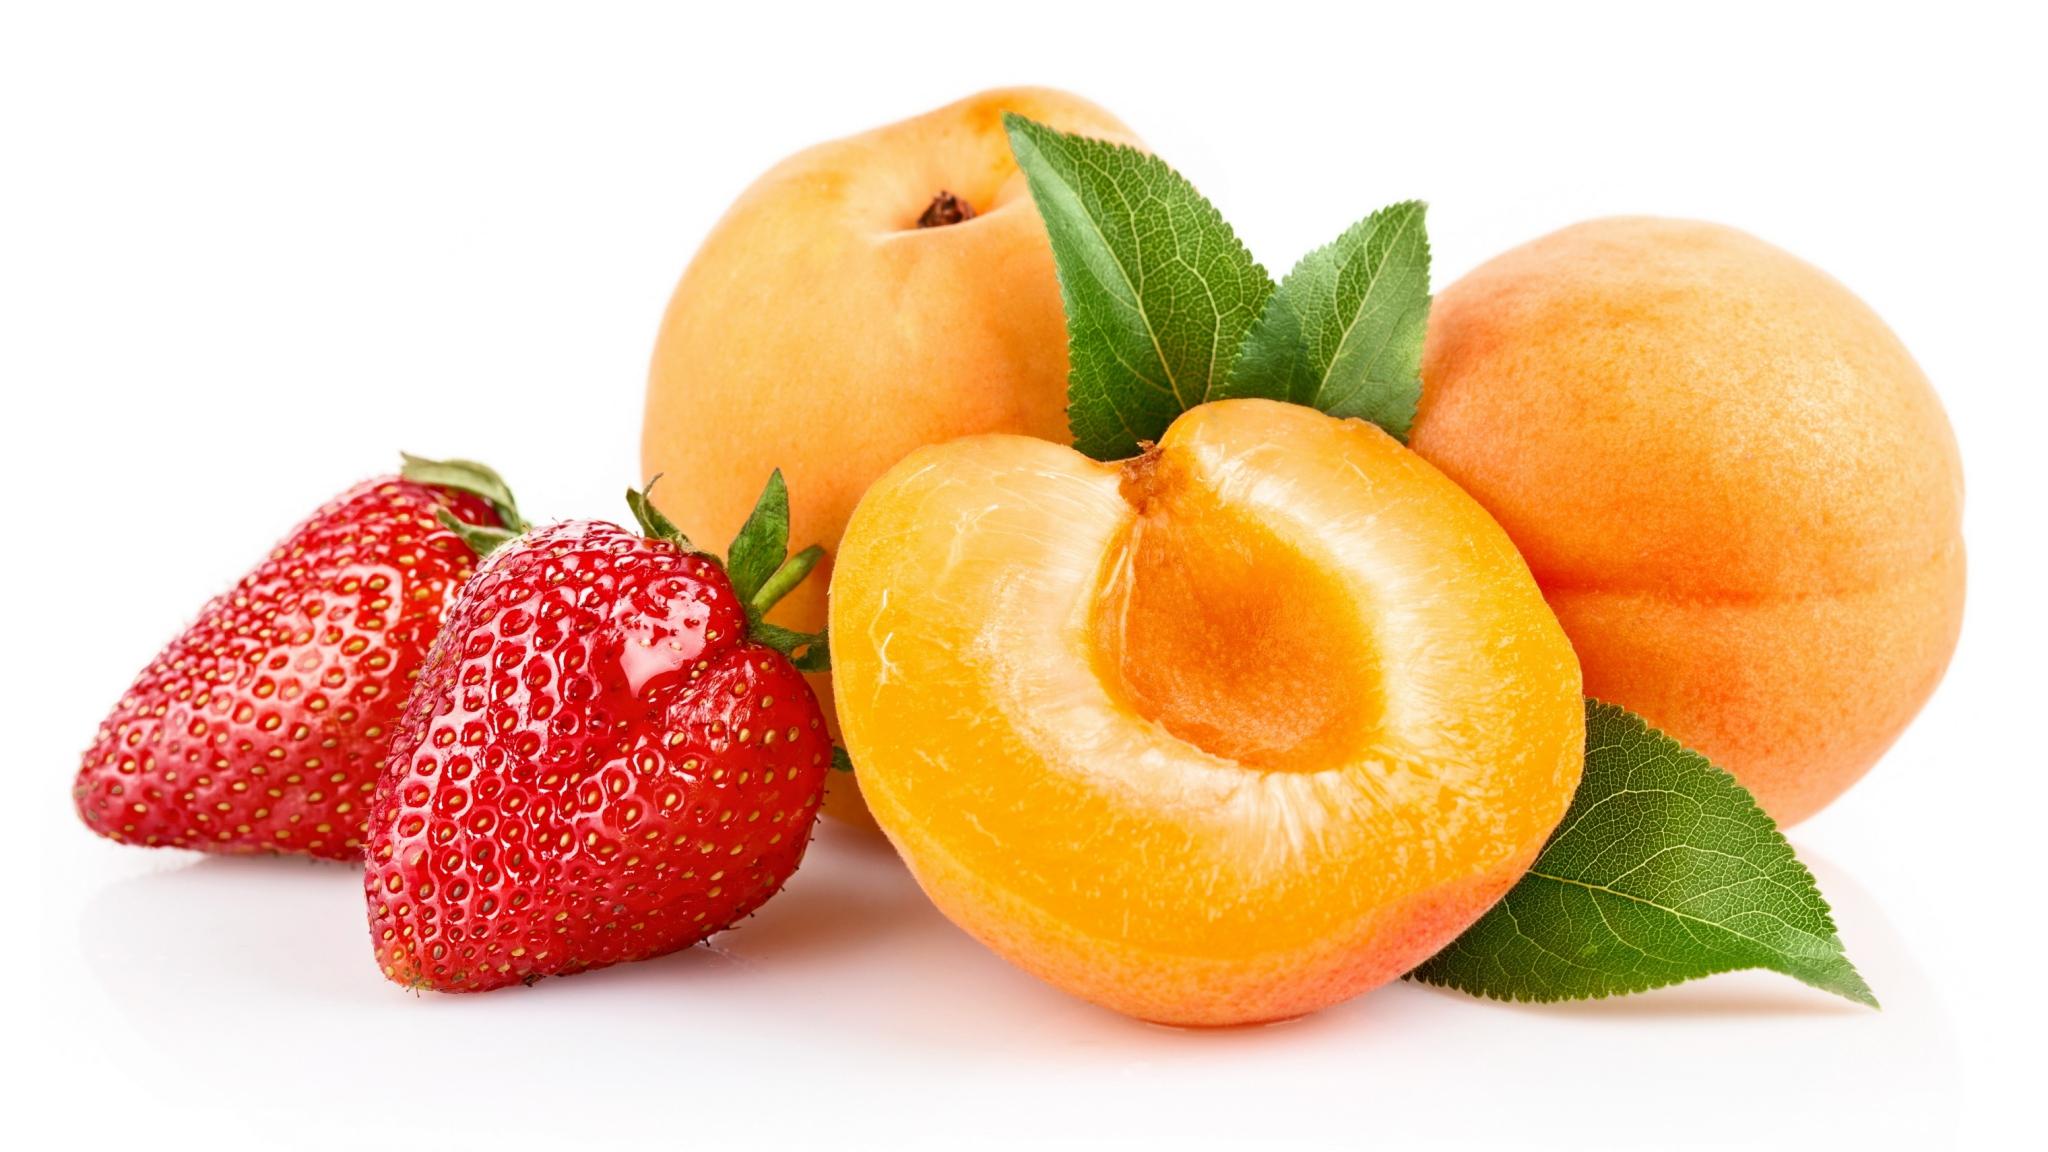 Apricot fruit photos